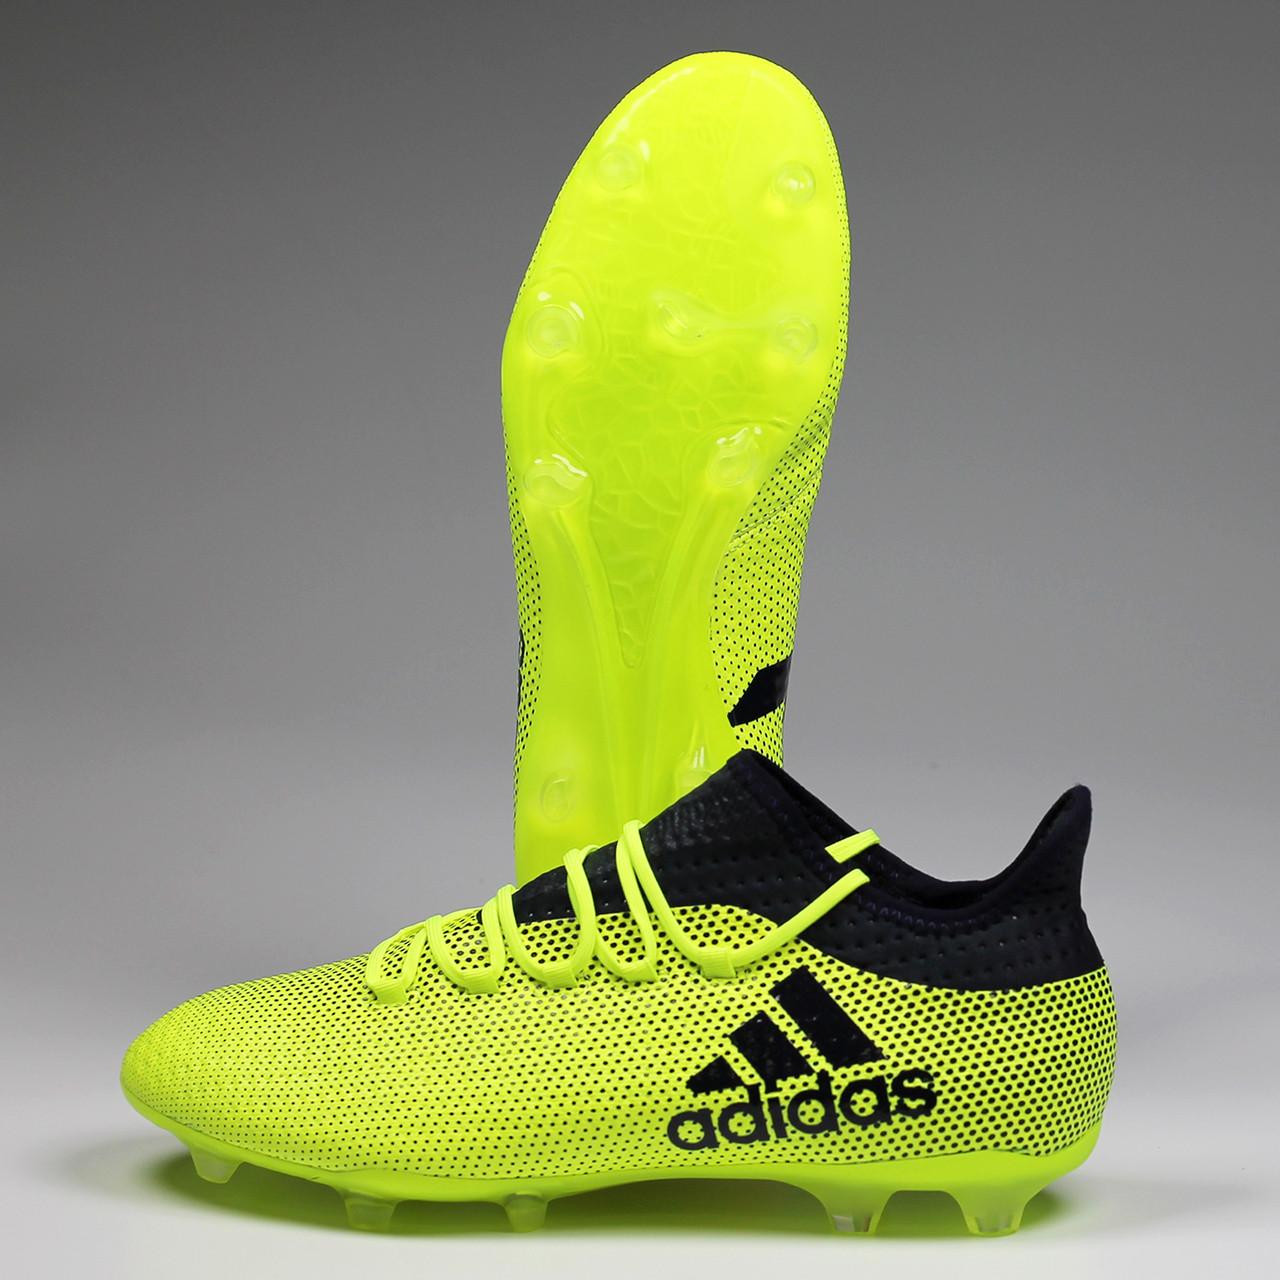 size 40 6c2eb 4fce8 Adidas X 17.2 FG Men's Soccer Cleats S82325 - Yellow